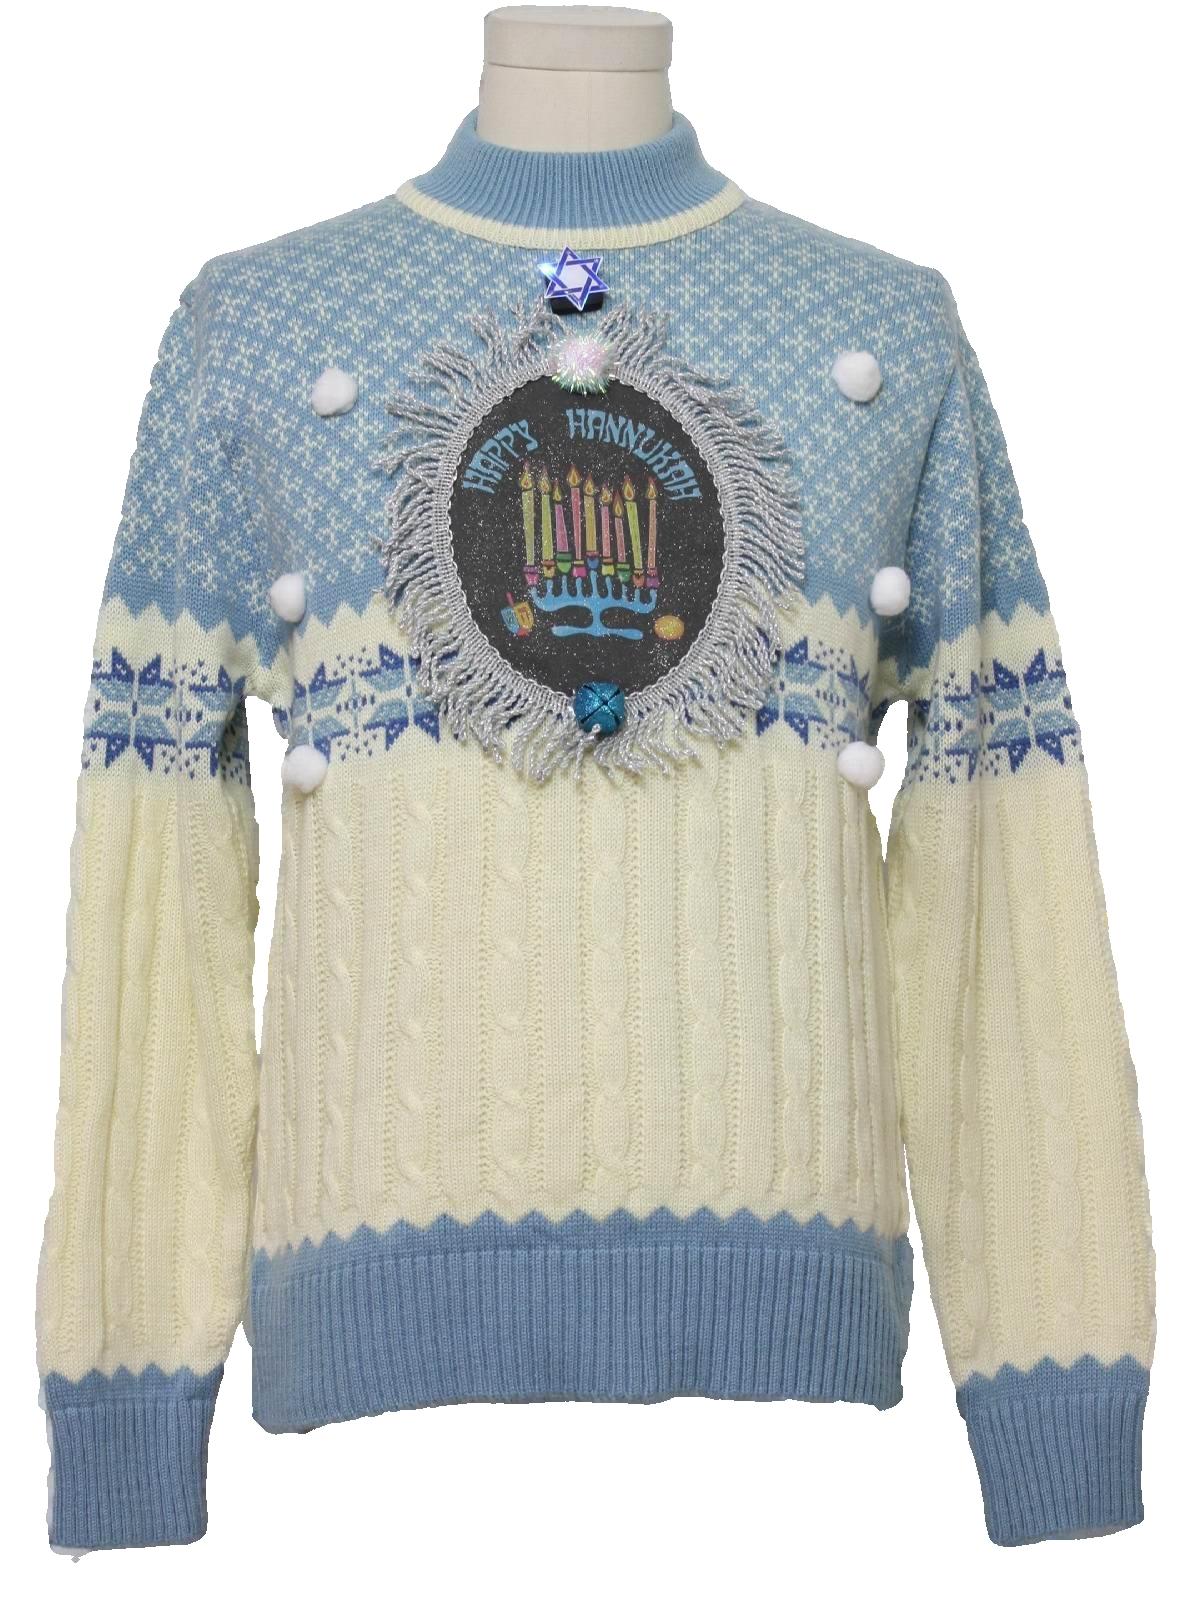 Dillards Unisex Hanukkah Ugly Christmas Sweater